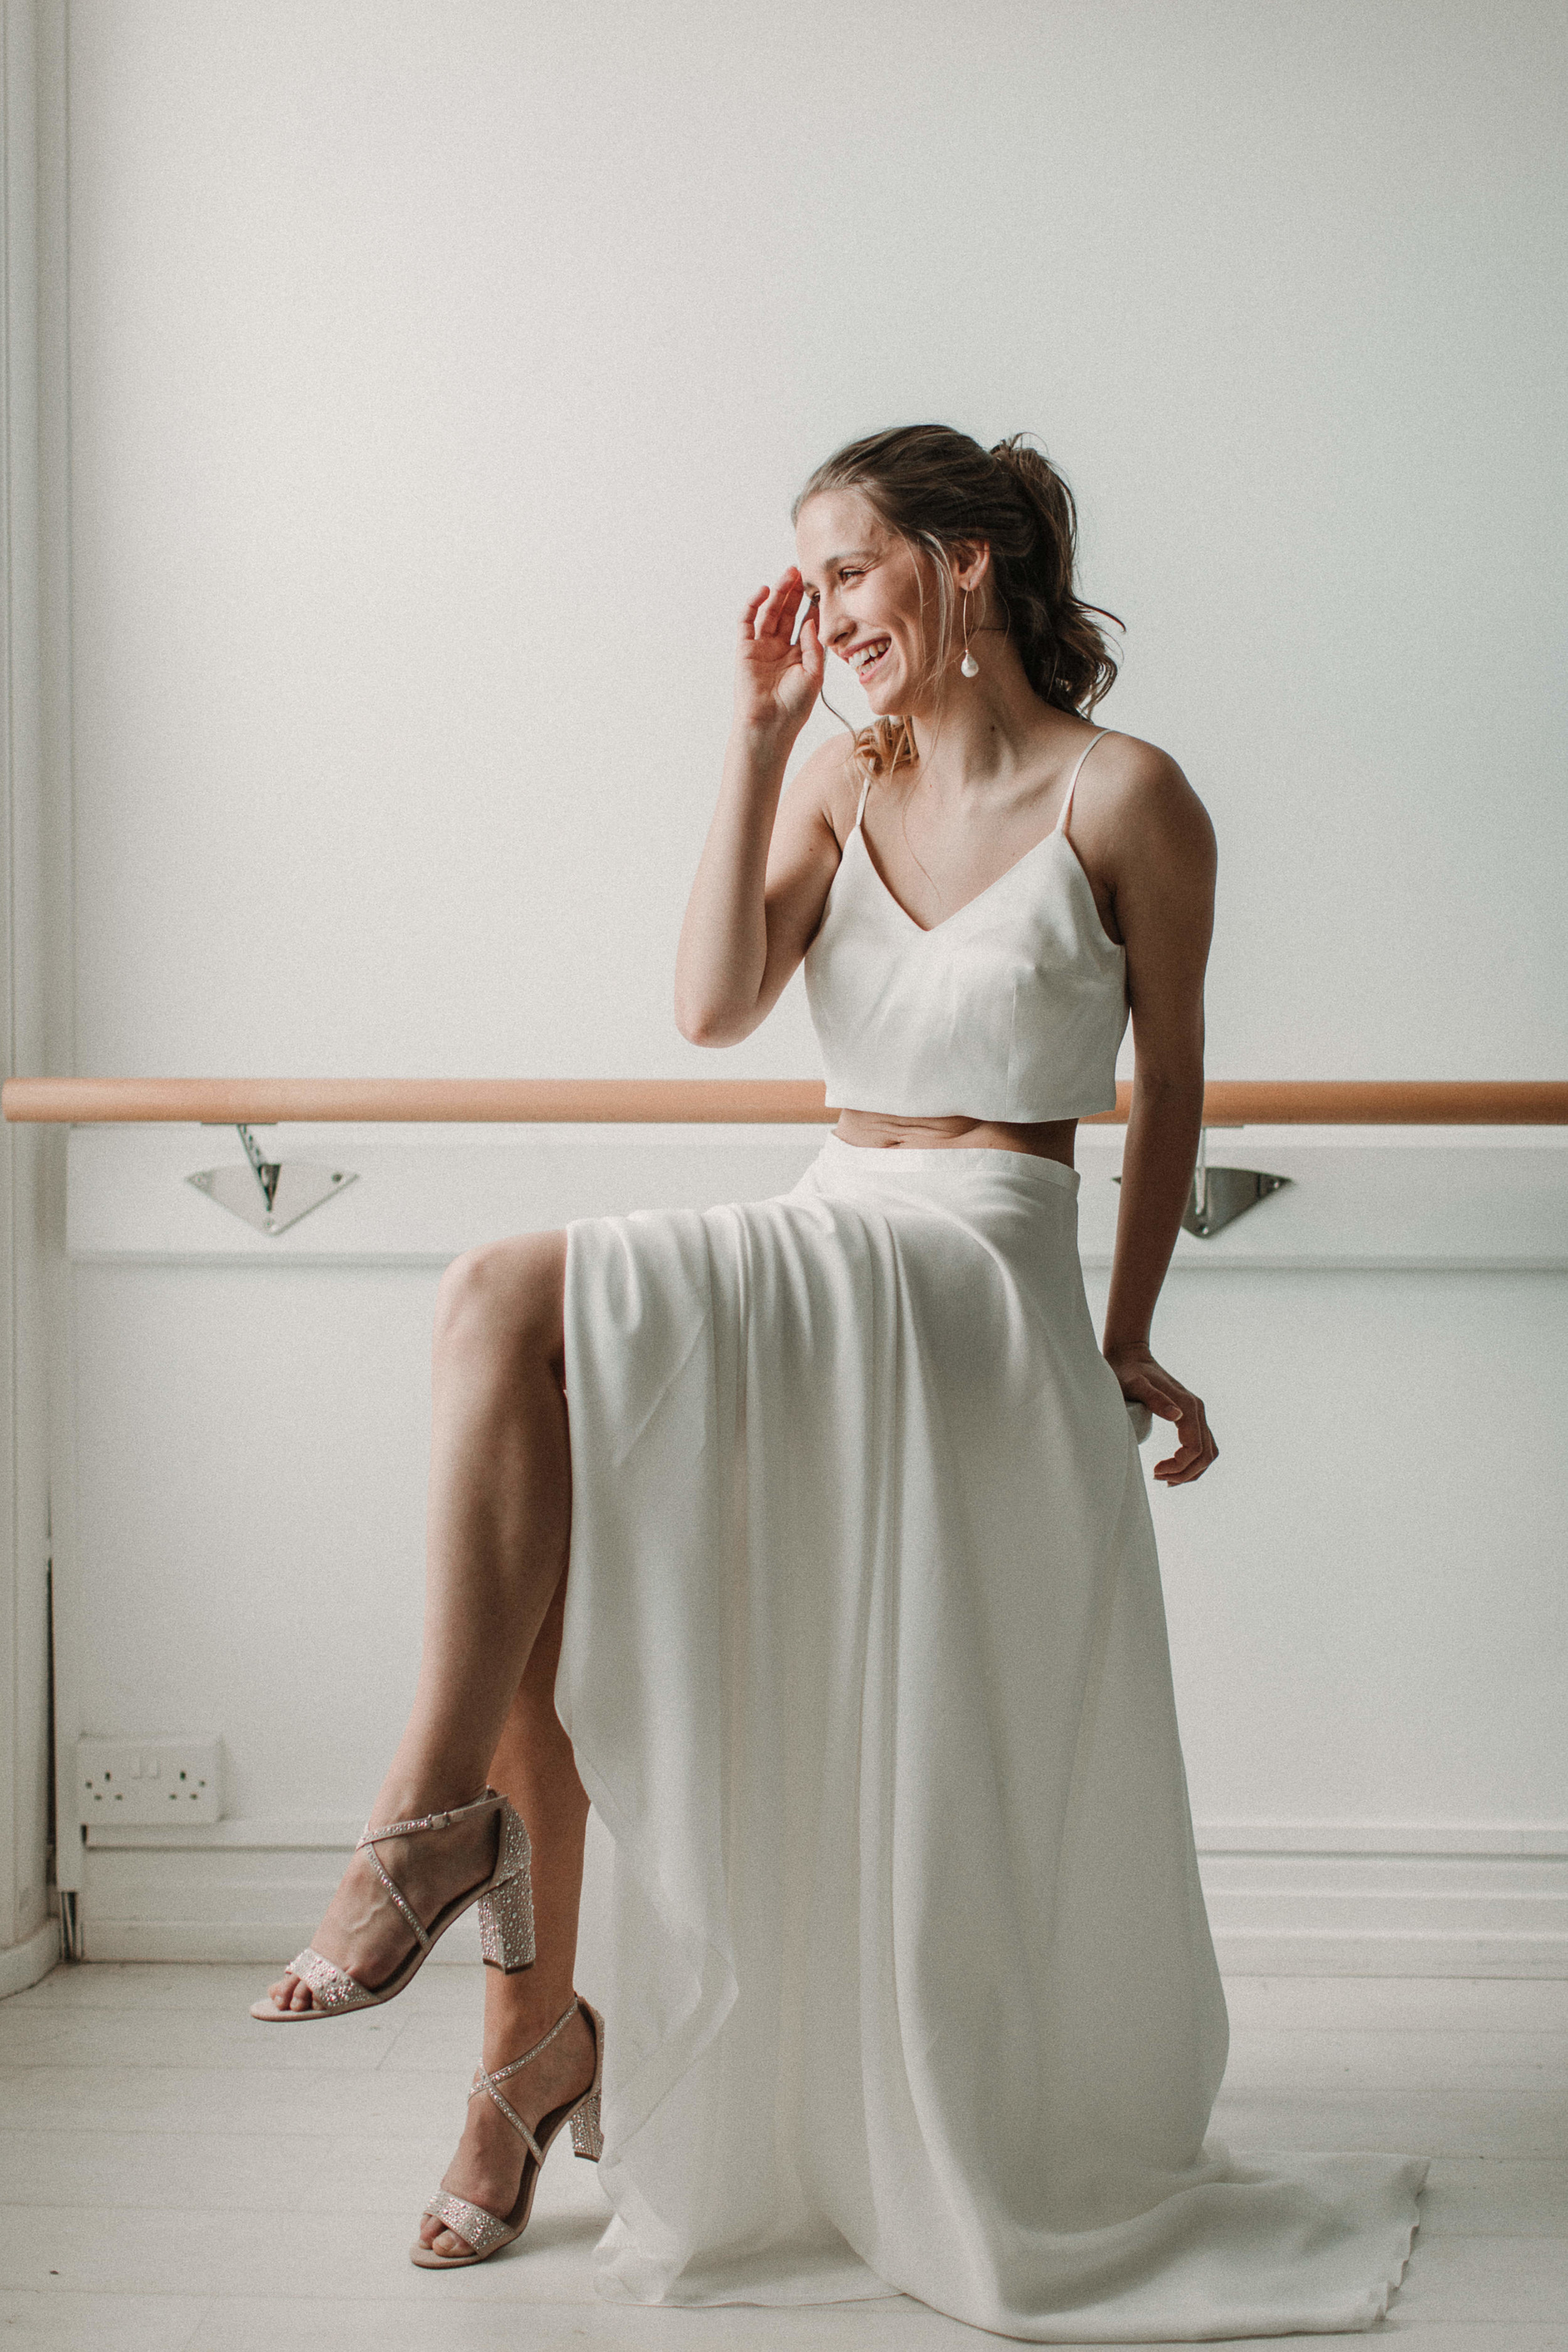 npluck_luna_bride-123.jpg